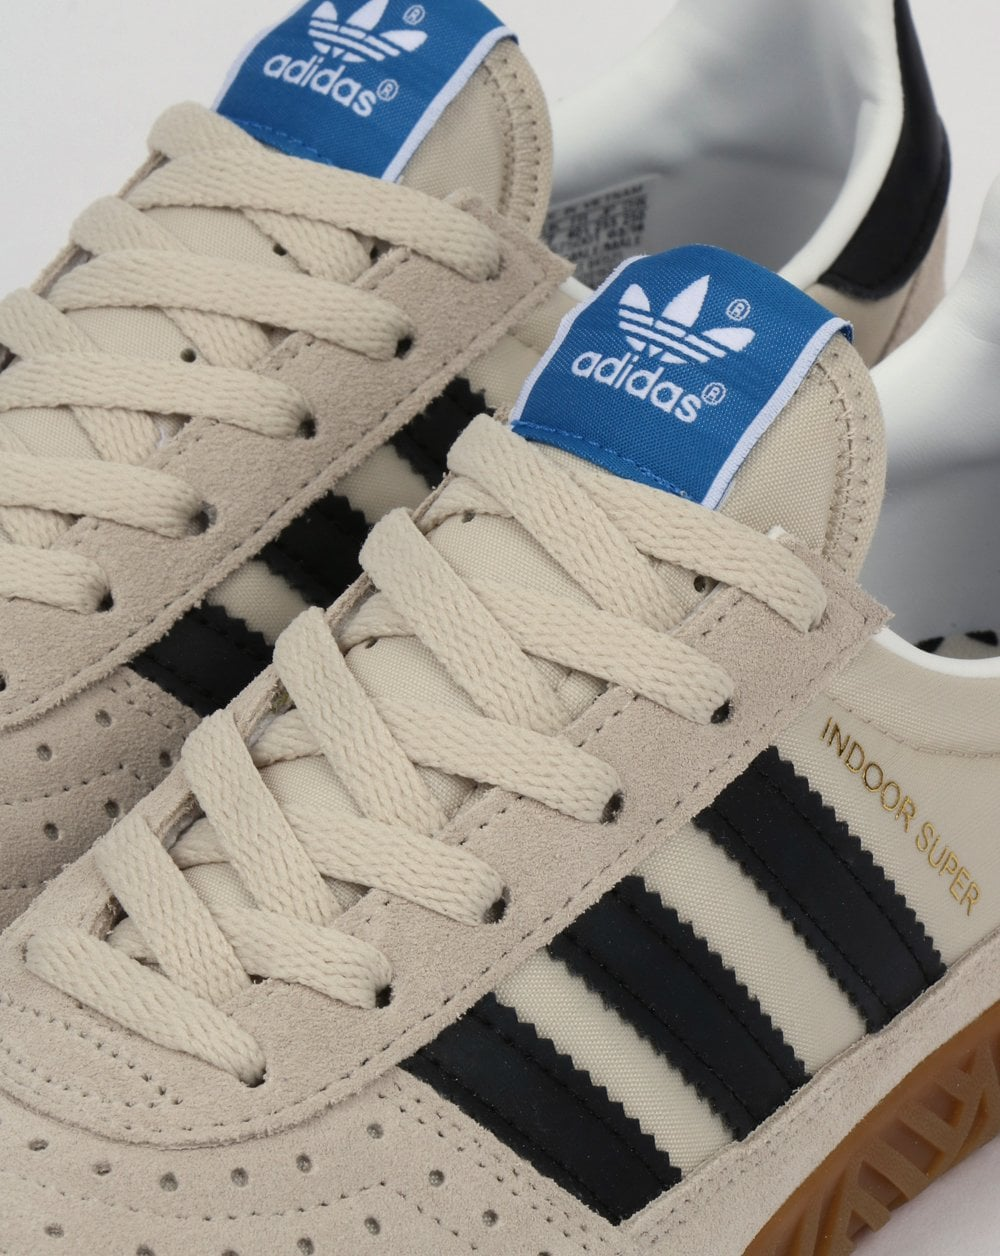 d470825de807 Adidas Indoor Super Trainers Brown,Black,shoes,squash,suede,mens